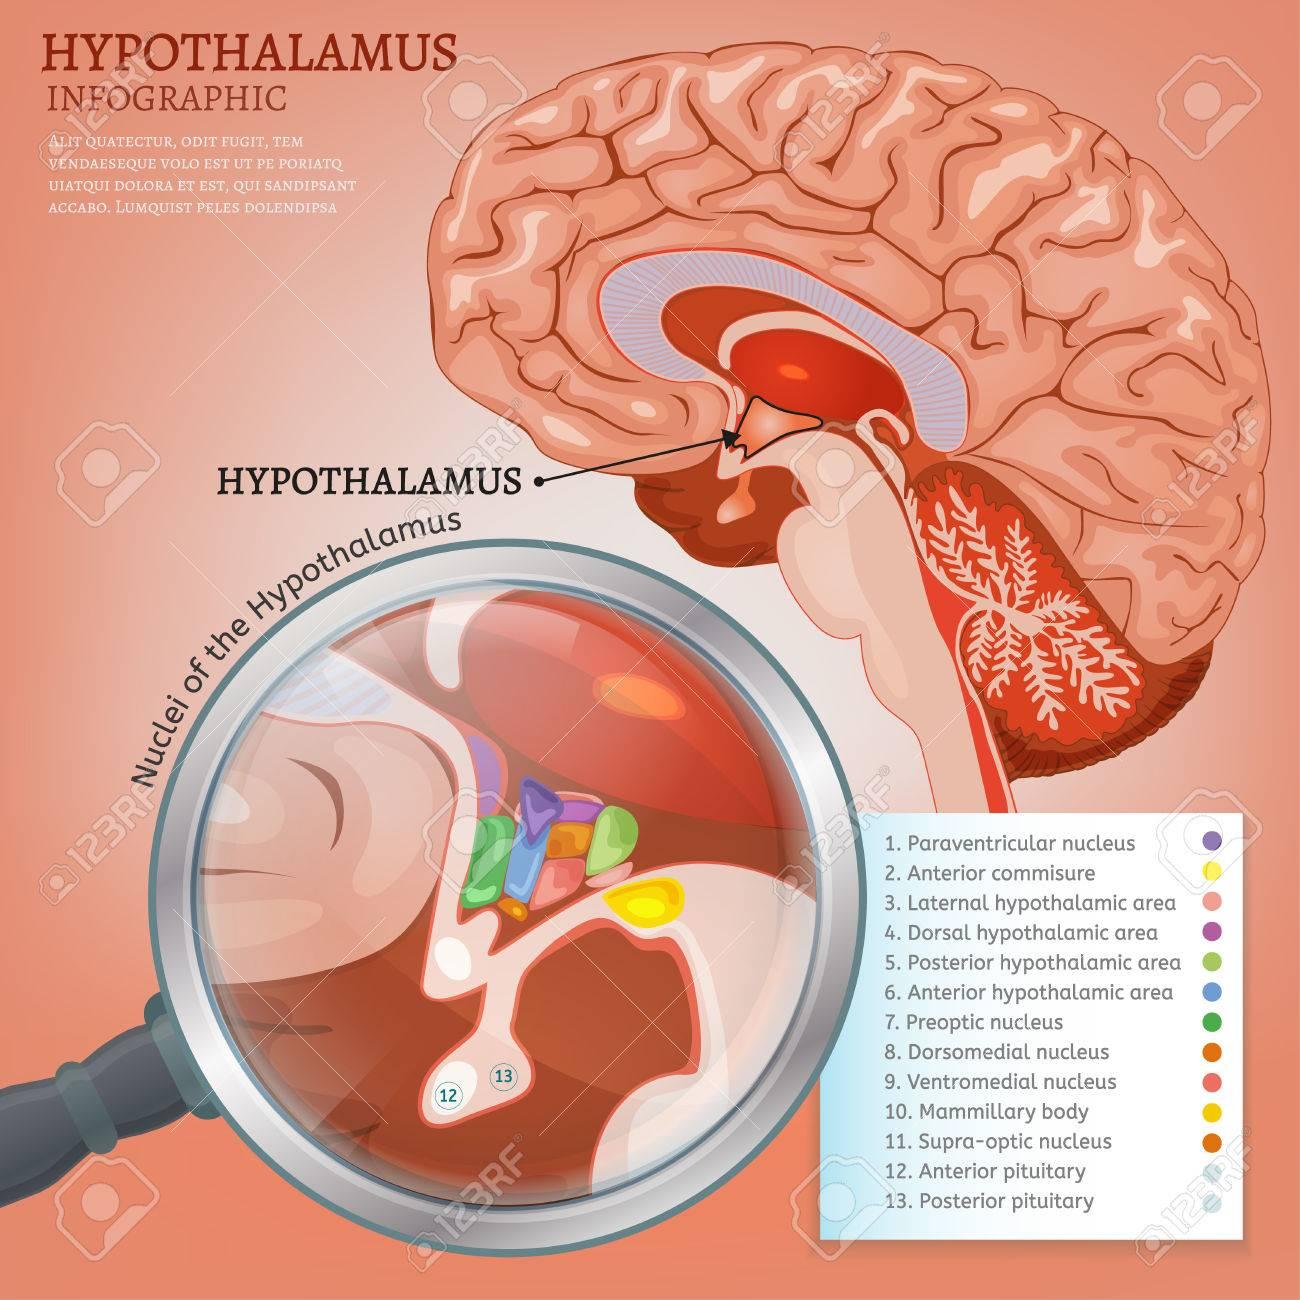 Hypothalamus Infographic Image Detailed Anatomy Of The Human